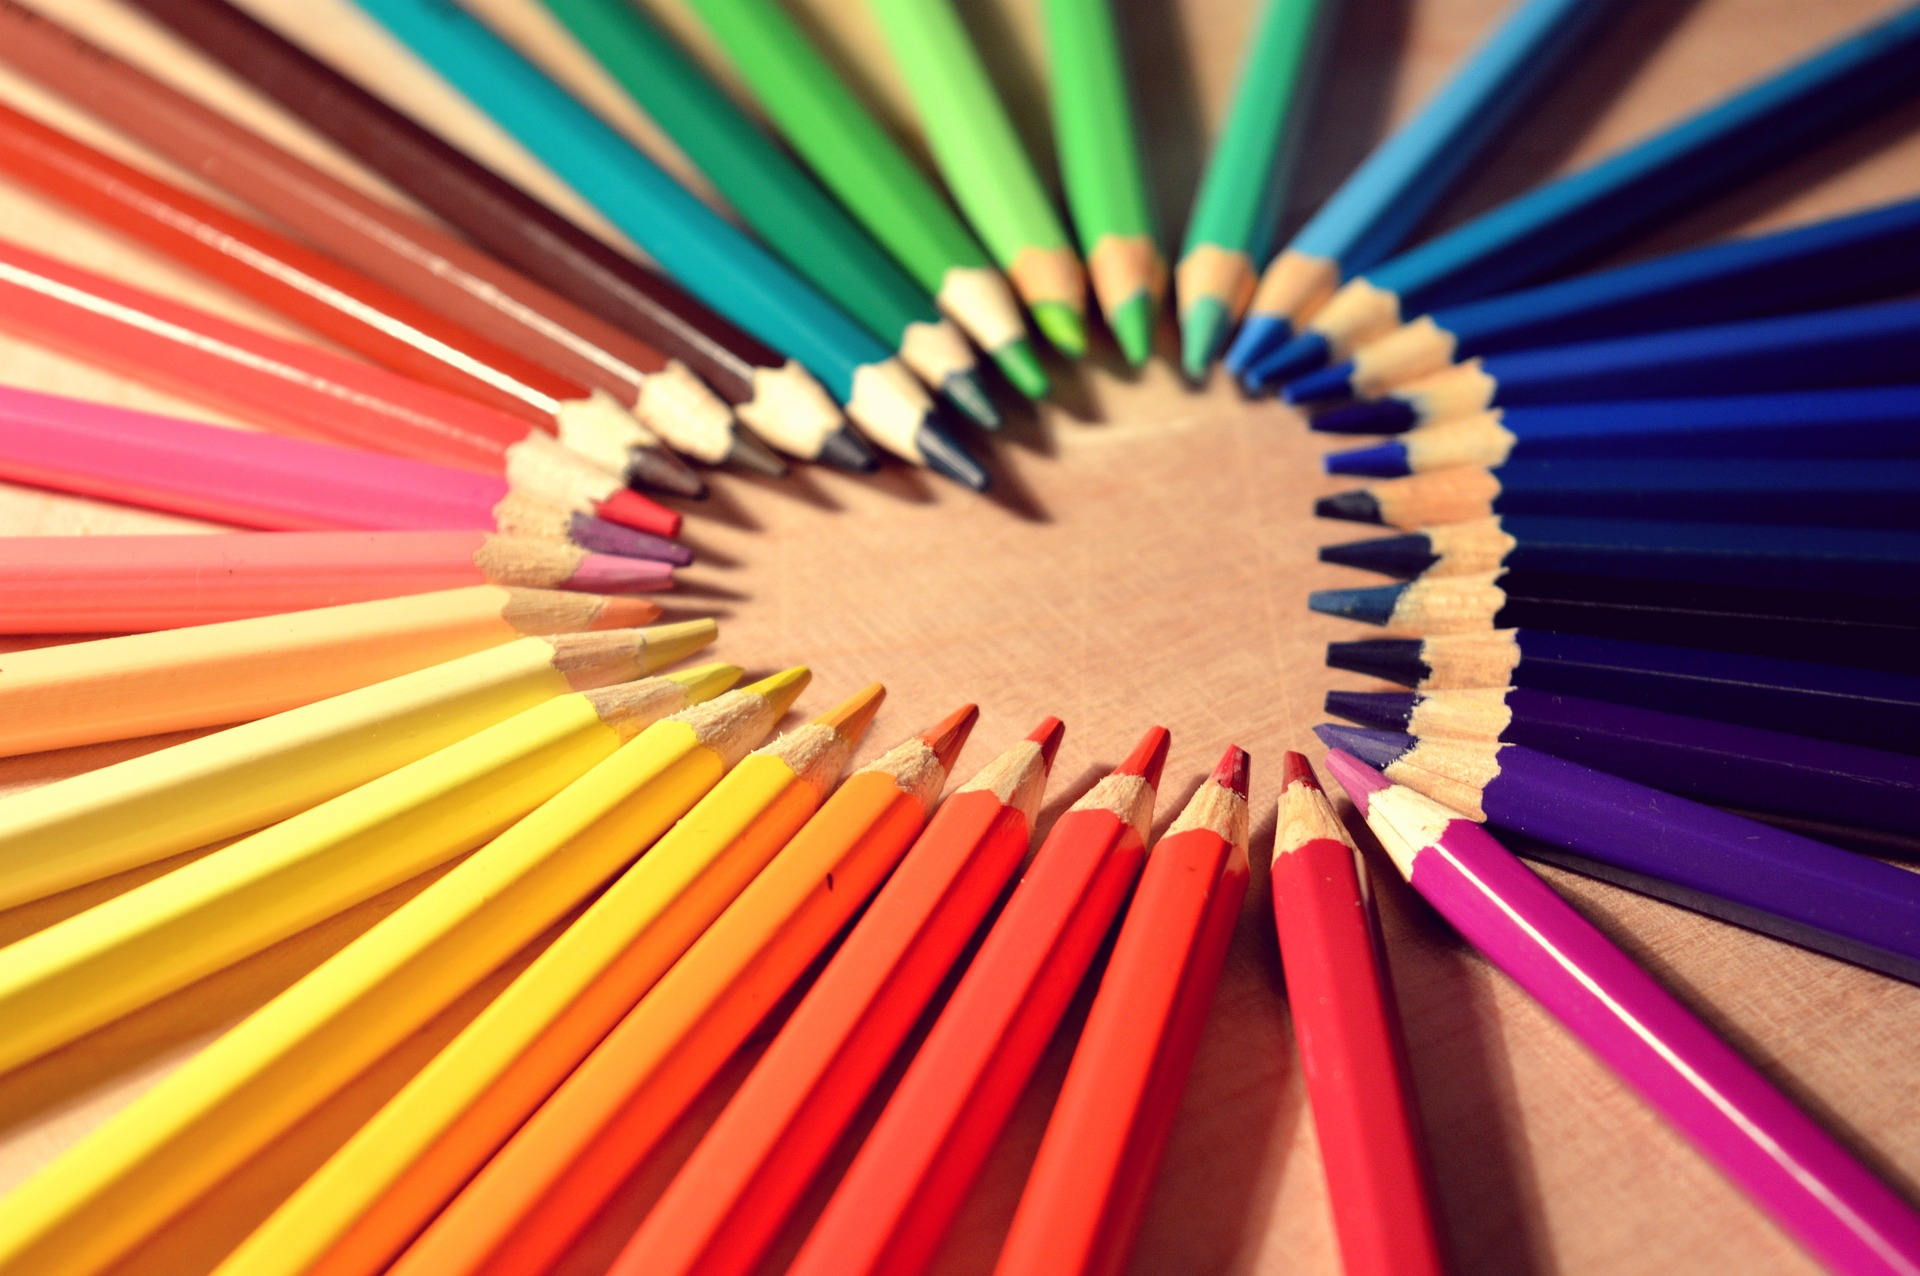 Heart fulll of colors